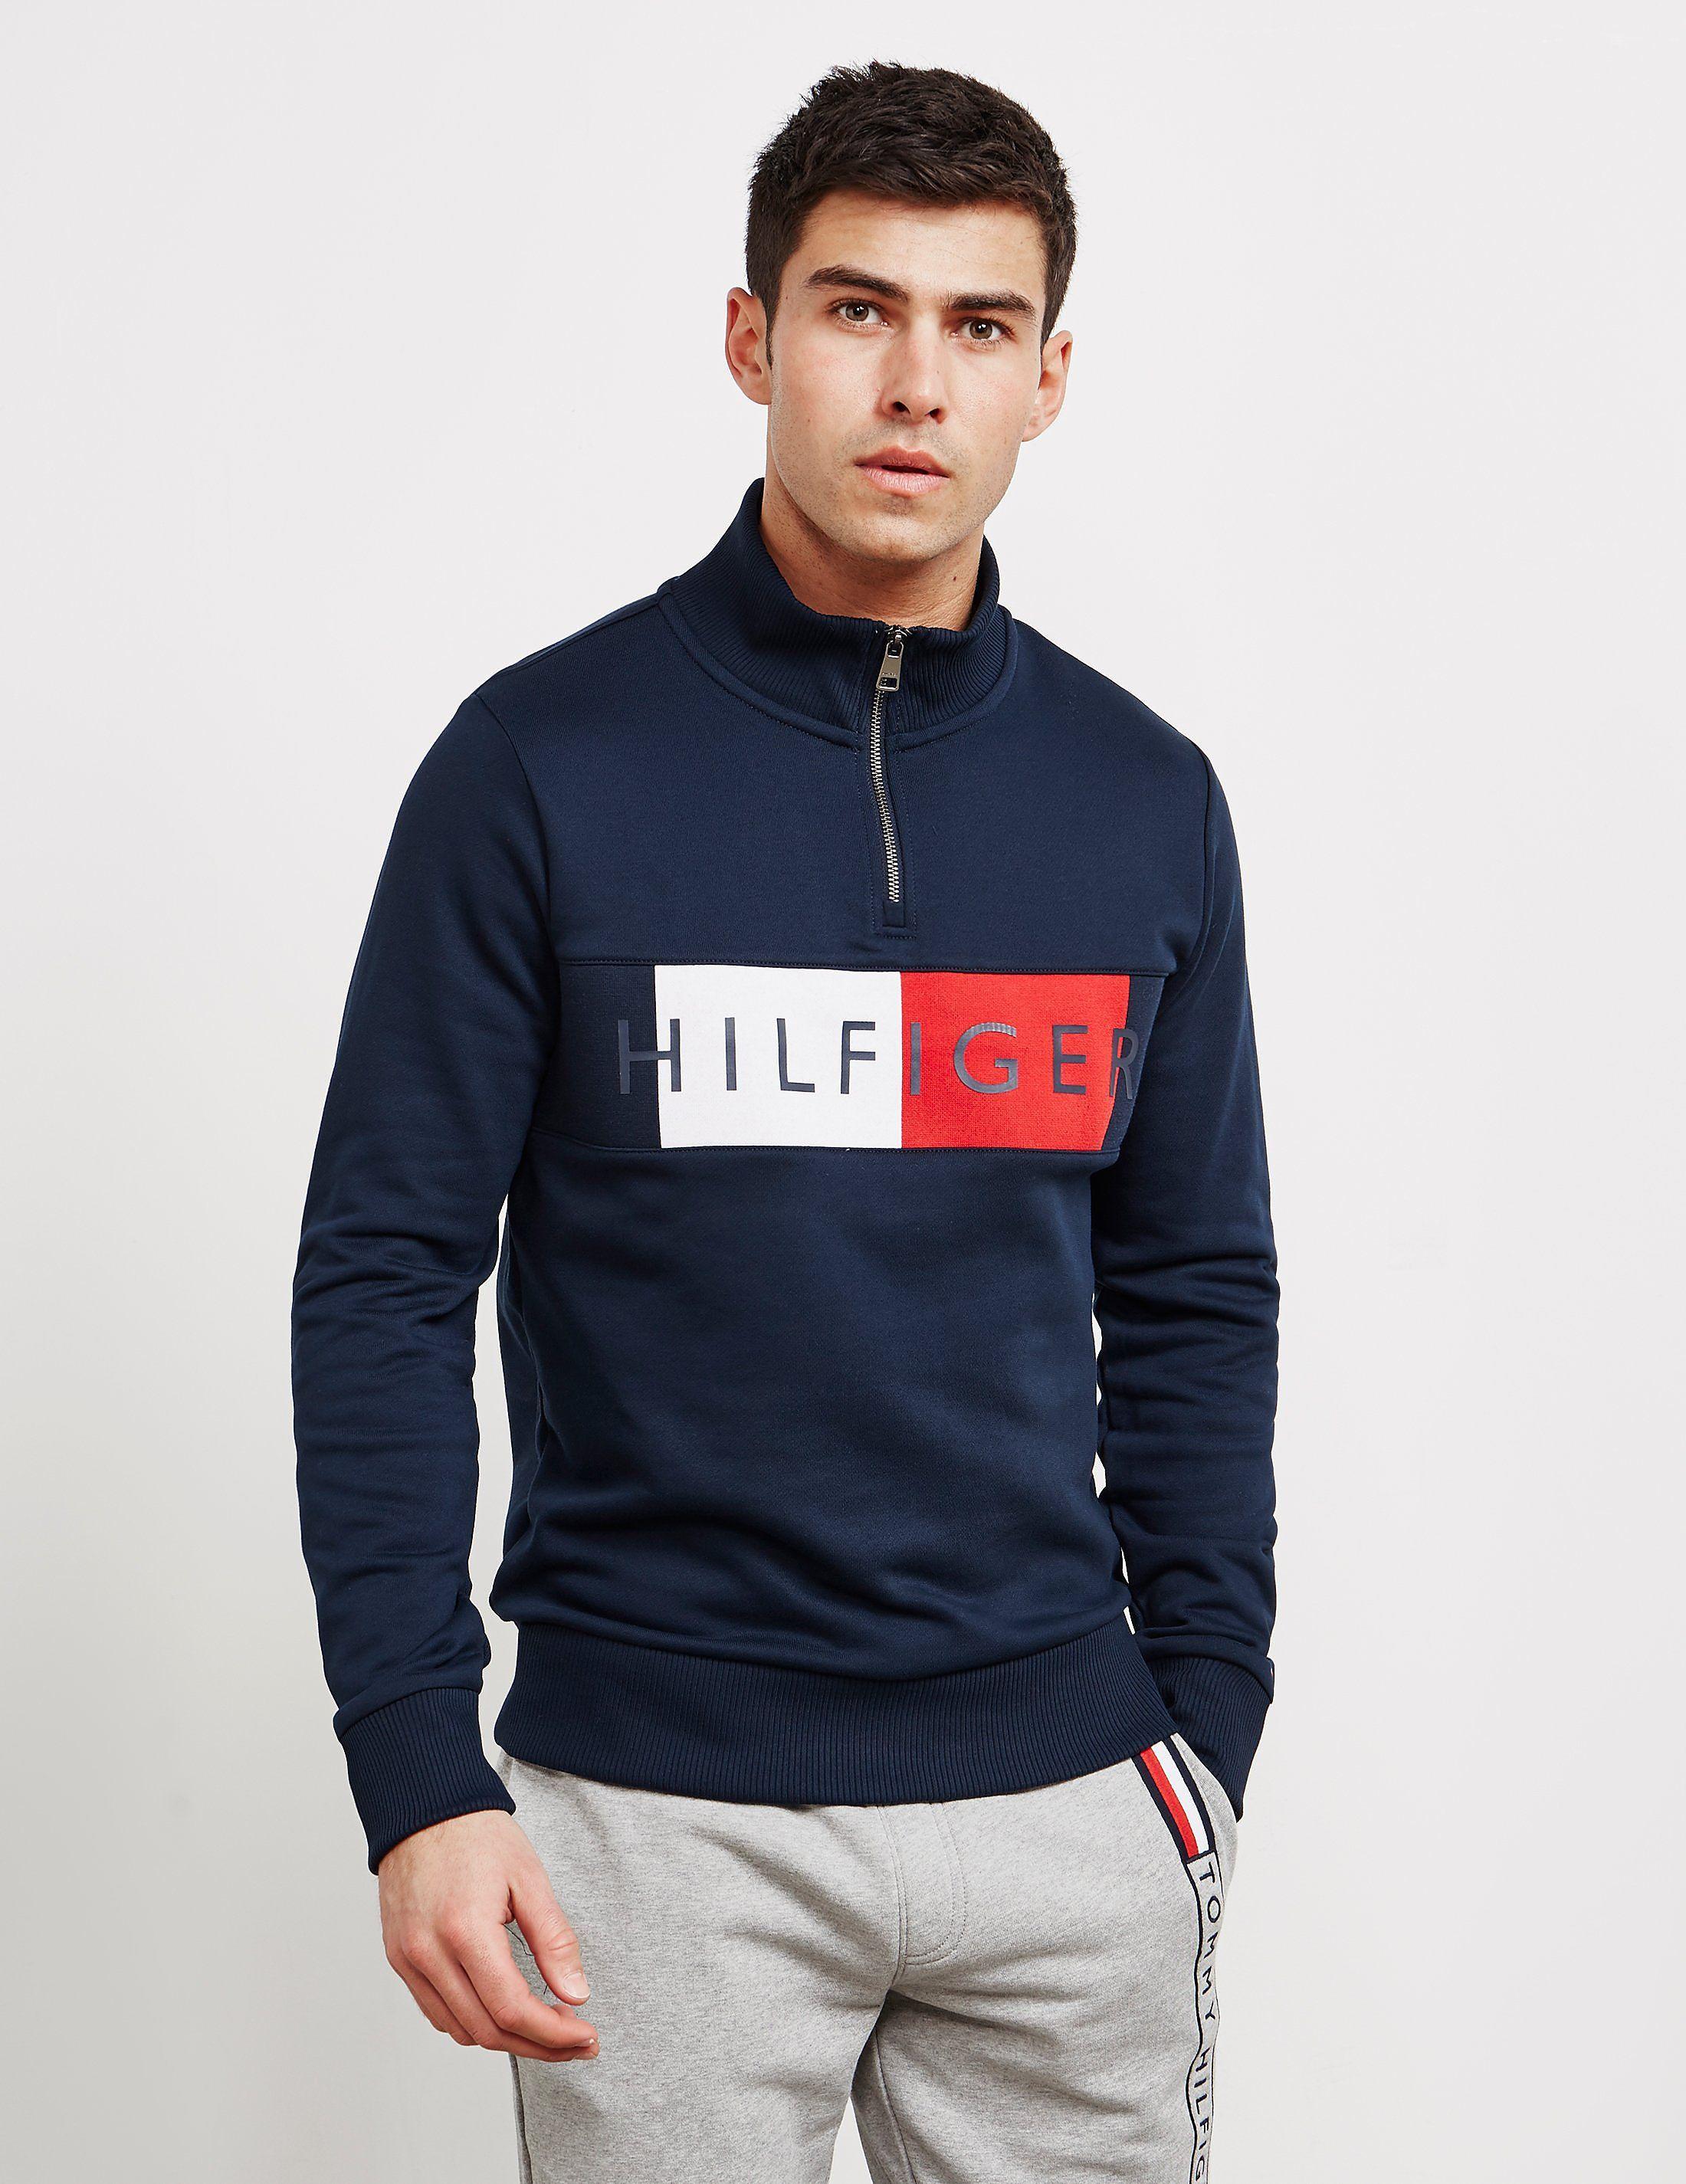 Tommy Hilfiger Half Zip Flag Sweatshirt Available At Tessuti The Luxury Designer Retailer For Men Wome Nike Clothes Mens Long Sleeve Tshirt Men Sweatshirts [ 2850 x 2200 Pixel ]